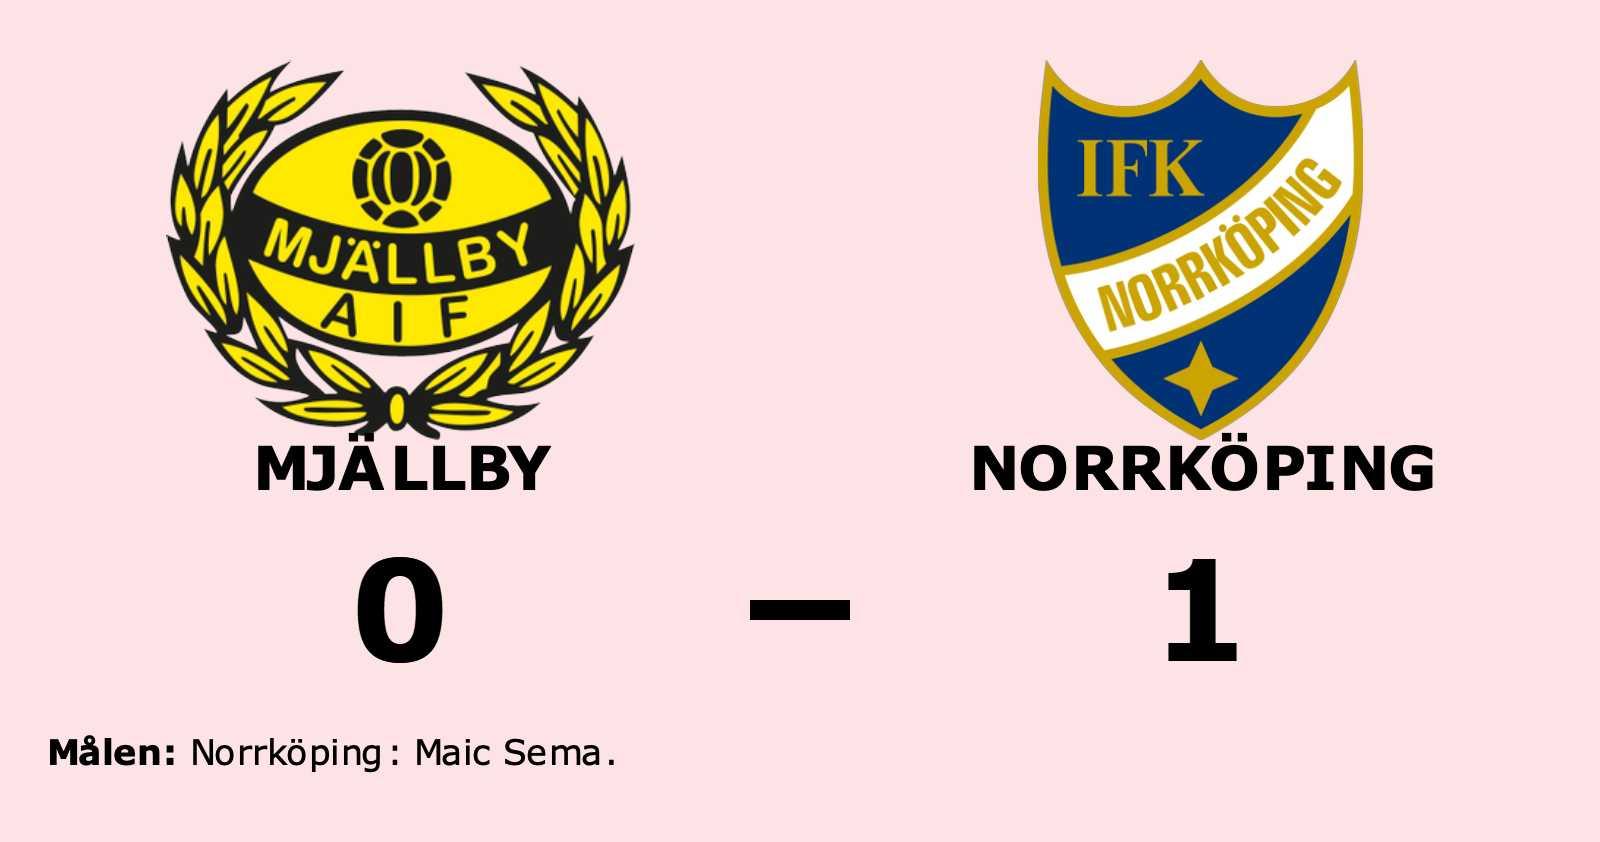 Norrköping slog Mjällby med uddamålet